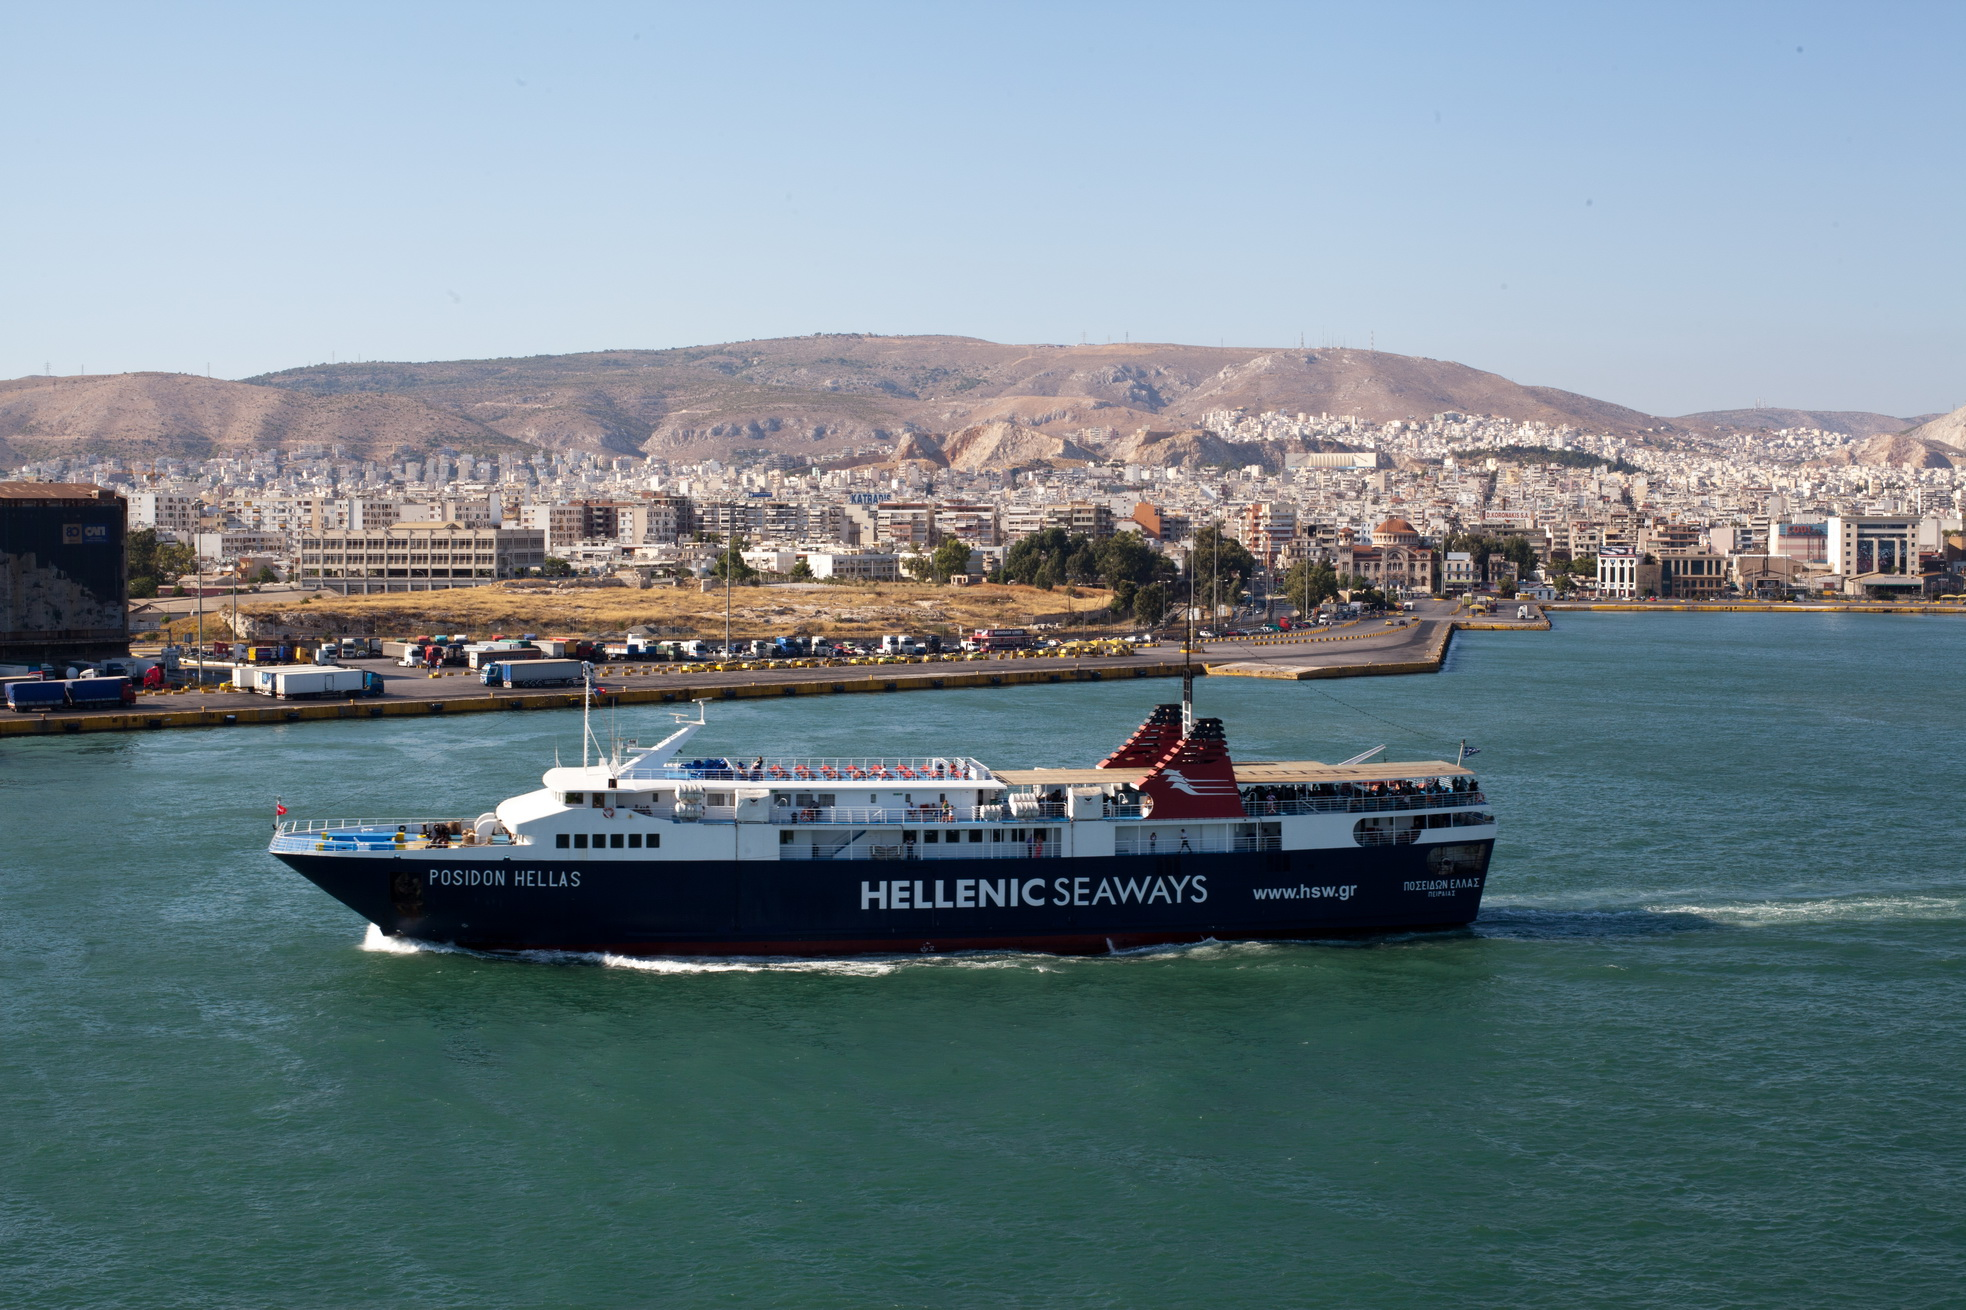 MS Posidon Hellas IMO 8966963 Hellenic Seaways Piraeus Port of Athens Greece 04